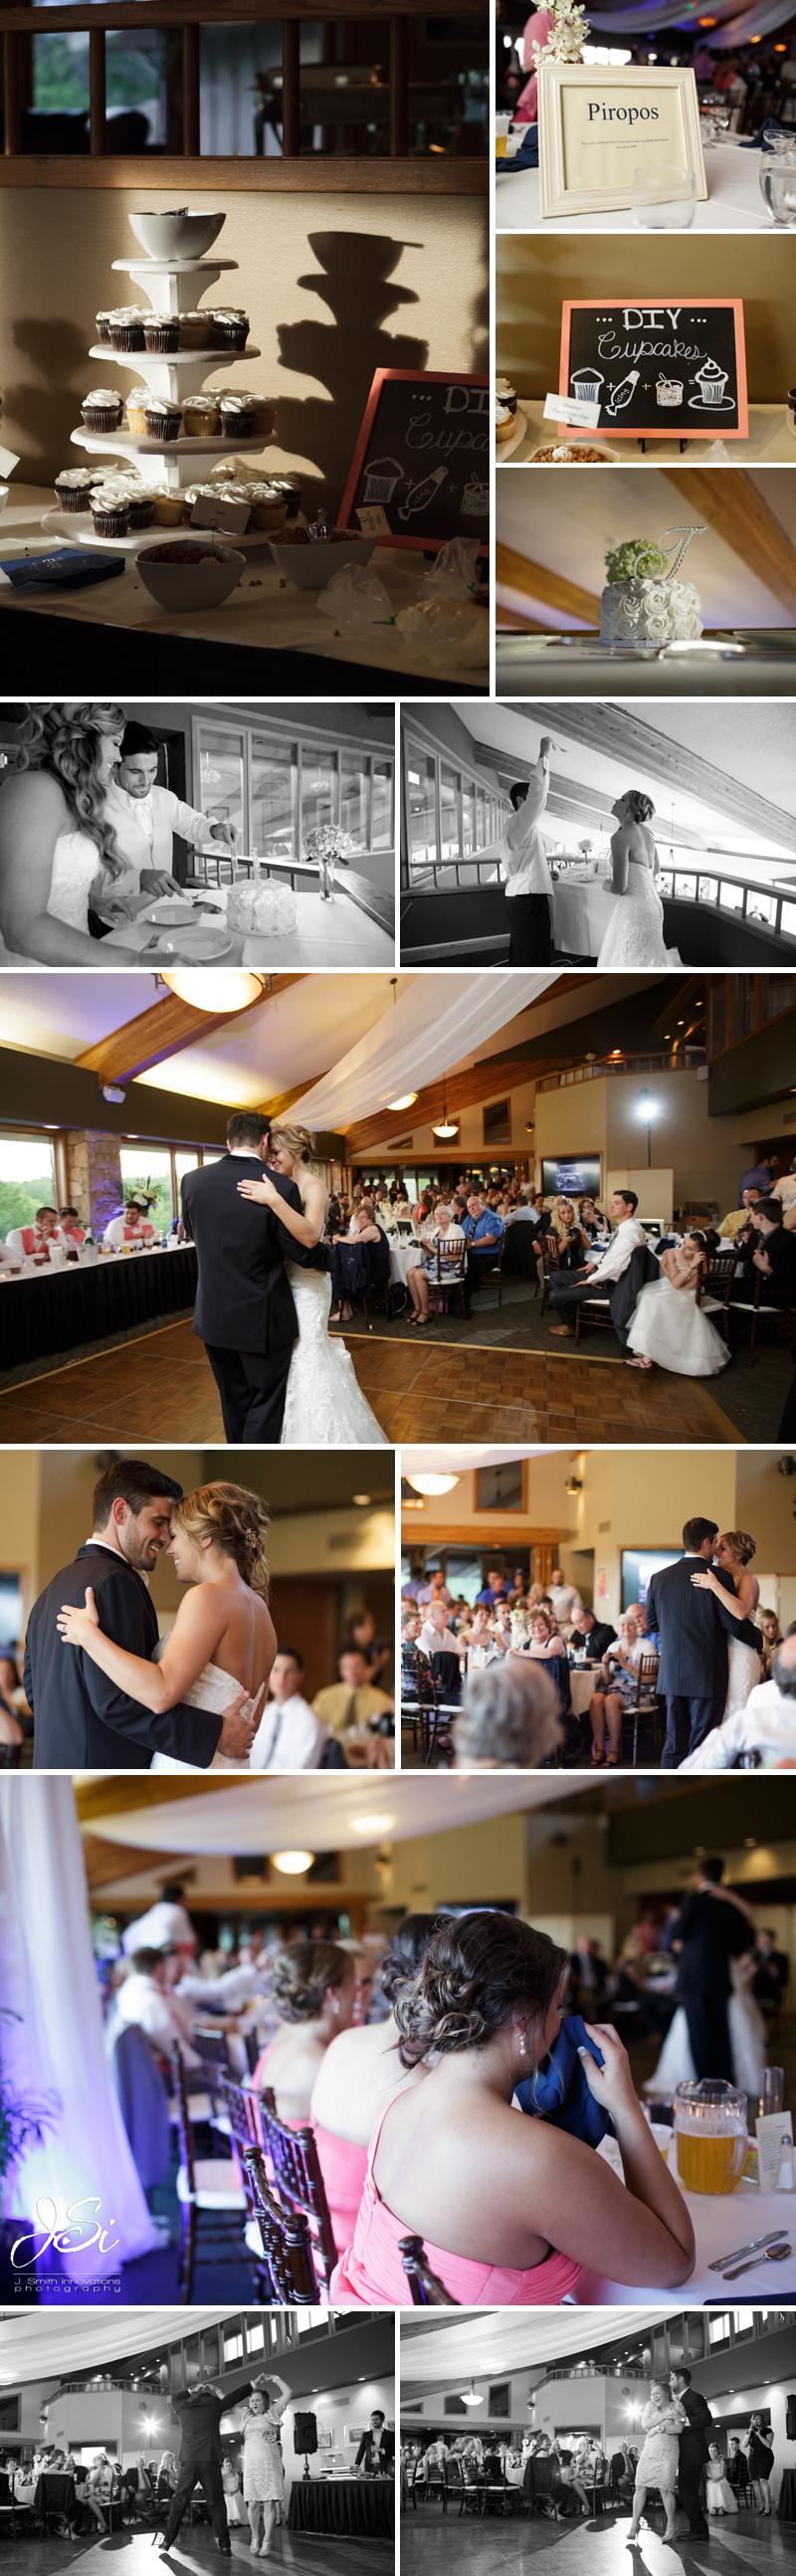 Lawrence Kansas Alvamar Country Club wedding photo